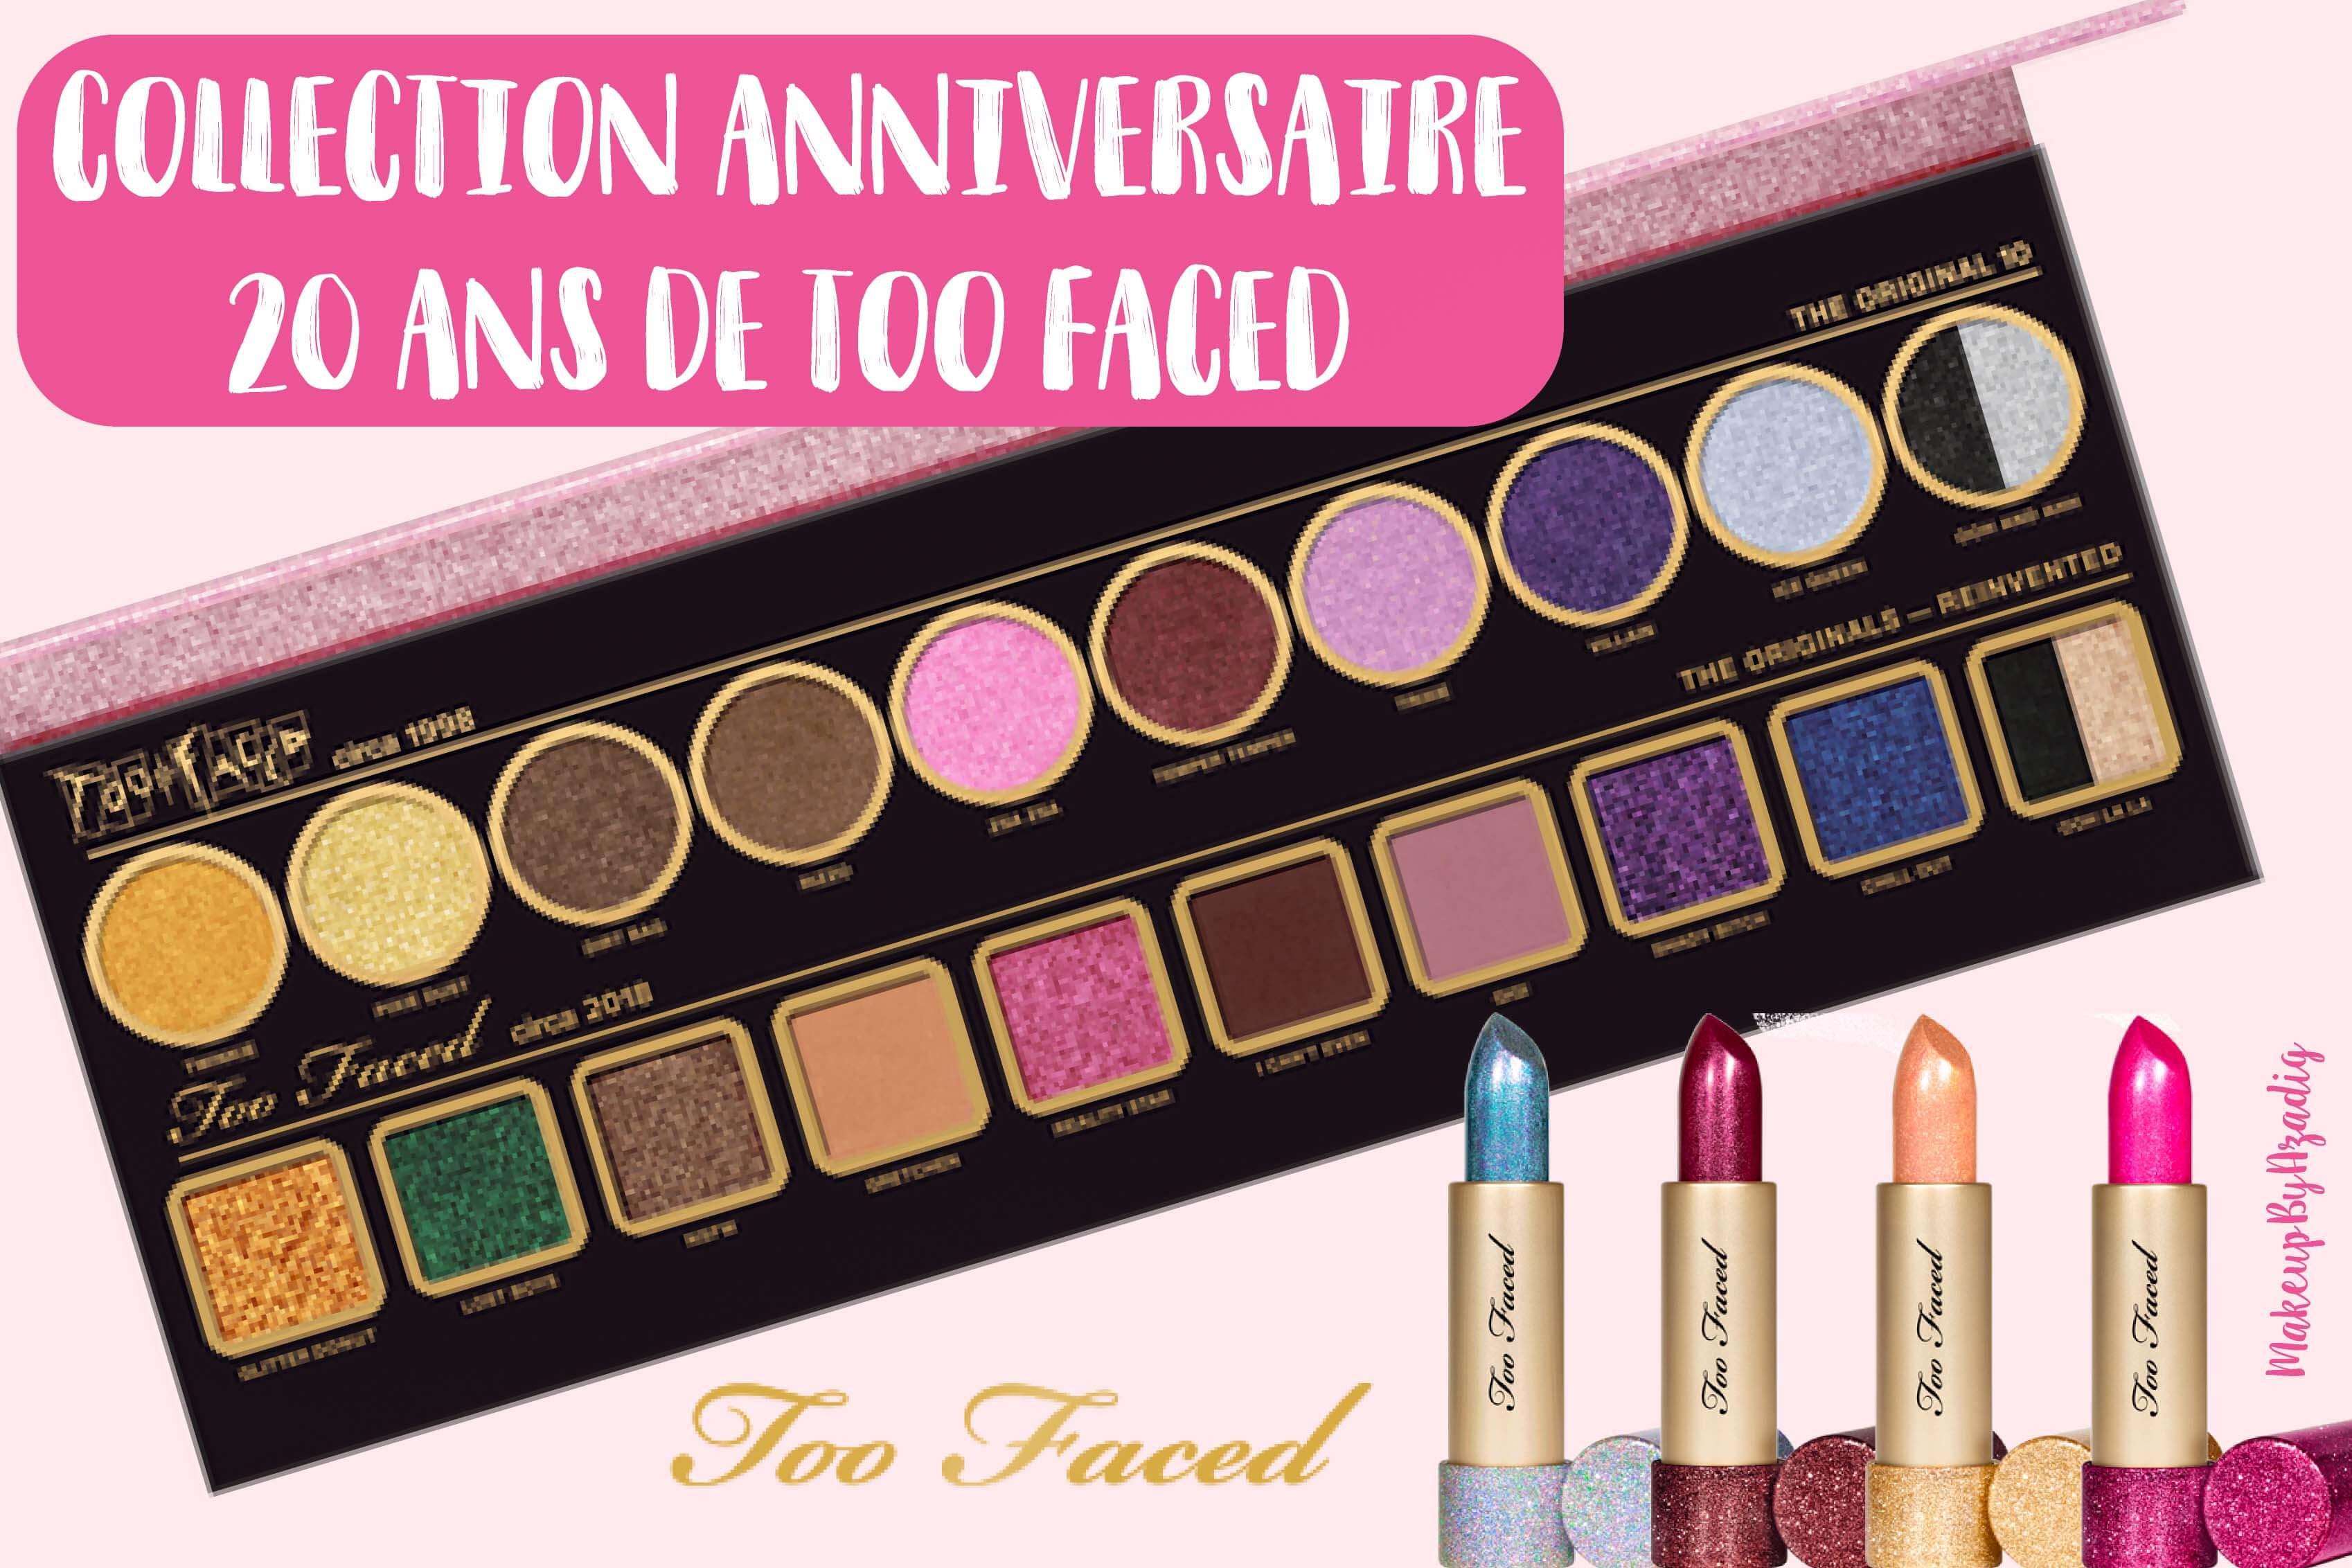 collection-anniversaire-too-faced-20-ans-rouges-a-levres-palette-swatch-avis-prix-sortie-france-makeupbyazadig-miniature